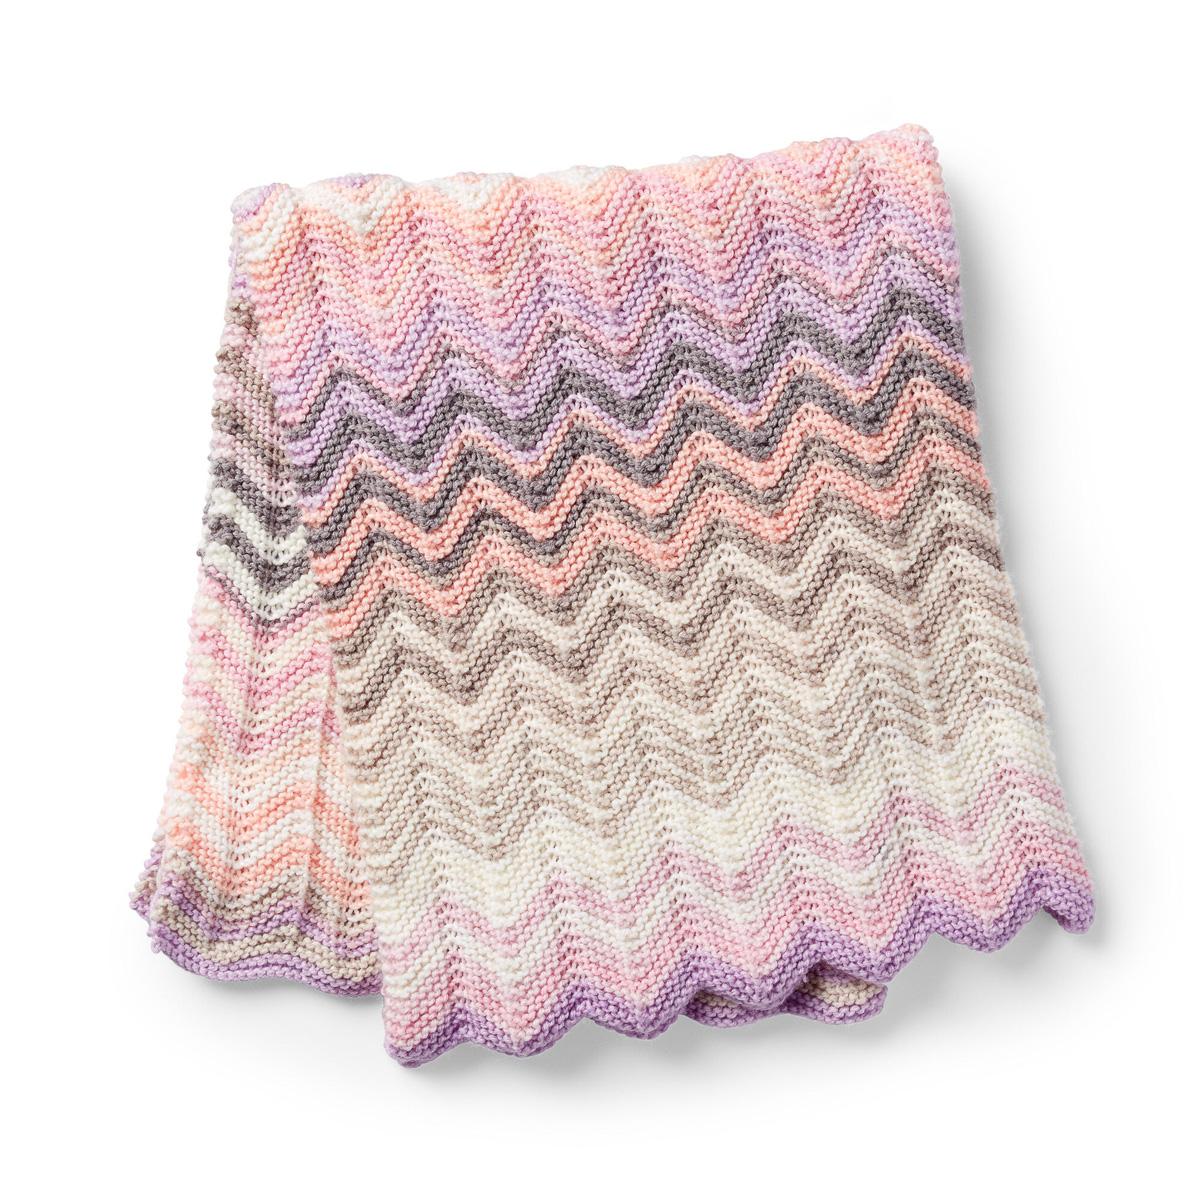 Caron-Baby-Cakes-Yarnspirations-Soft-Acrylic-Blend-Medium-4-Yarn-Cake-Knitting thumbnail 9